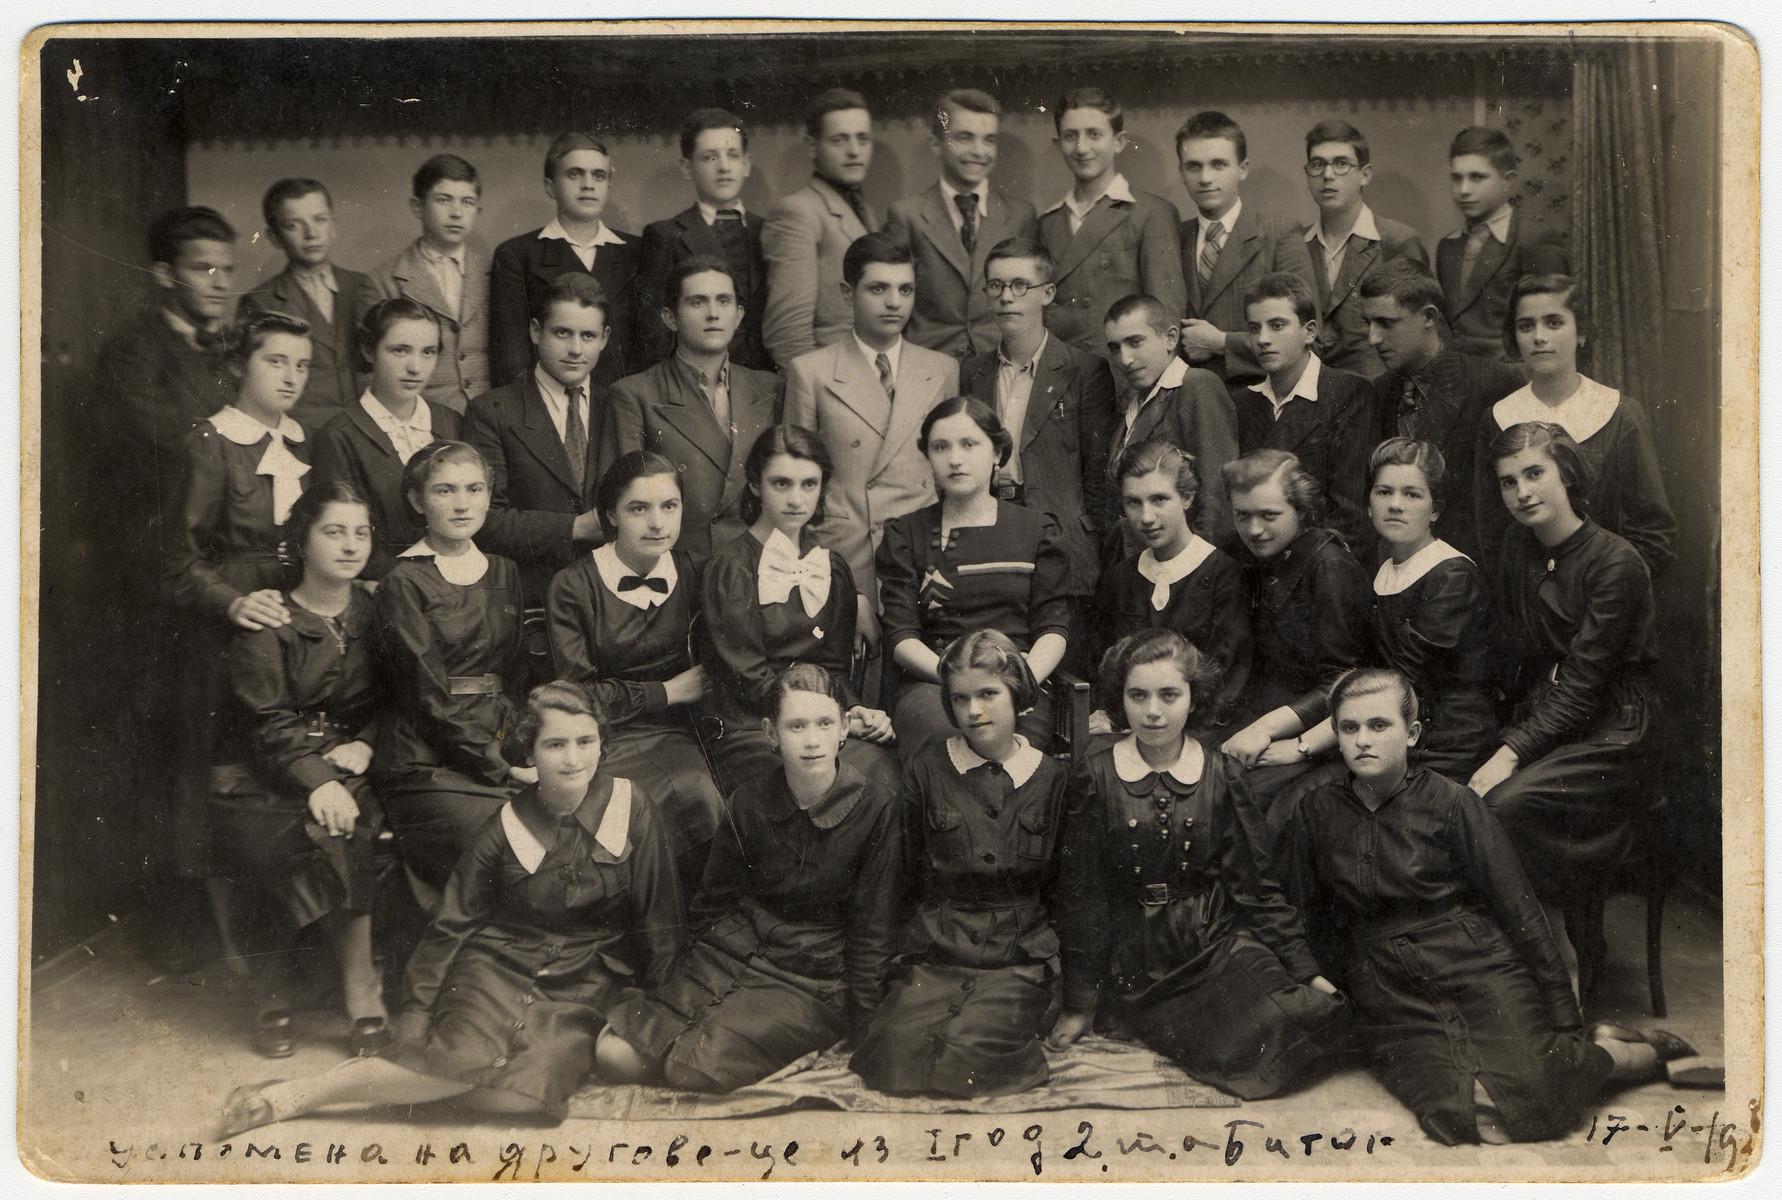 Group portrait of students in a business school.  Among those pictured are (front row, left to right): Jamila Kolonomos, Roza Kamhi, Redjina Shami, Rebeka Pardo, Marie Romano;  (third or fourth row?): Joco Beraha, and Leon Faradji.